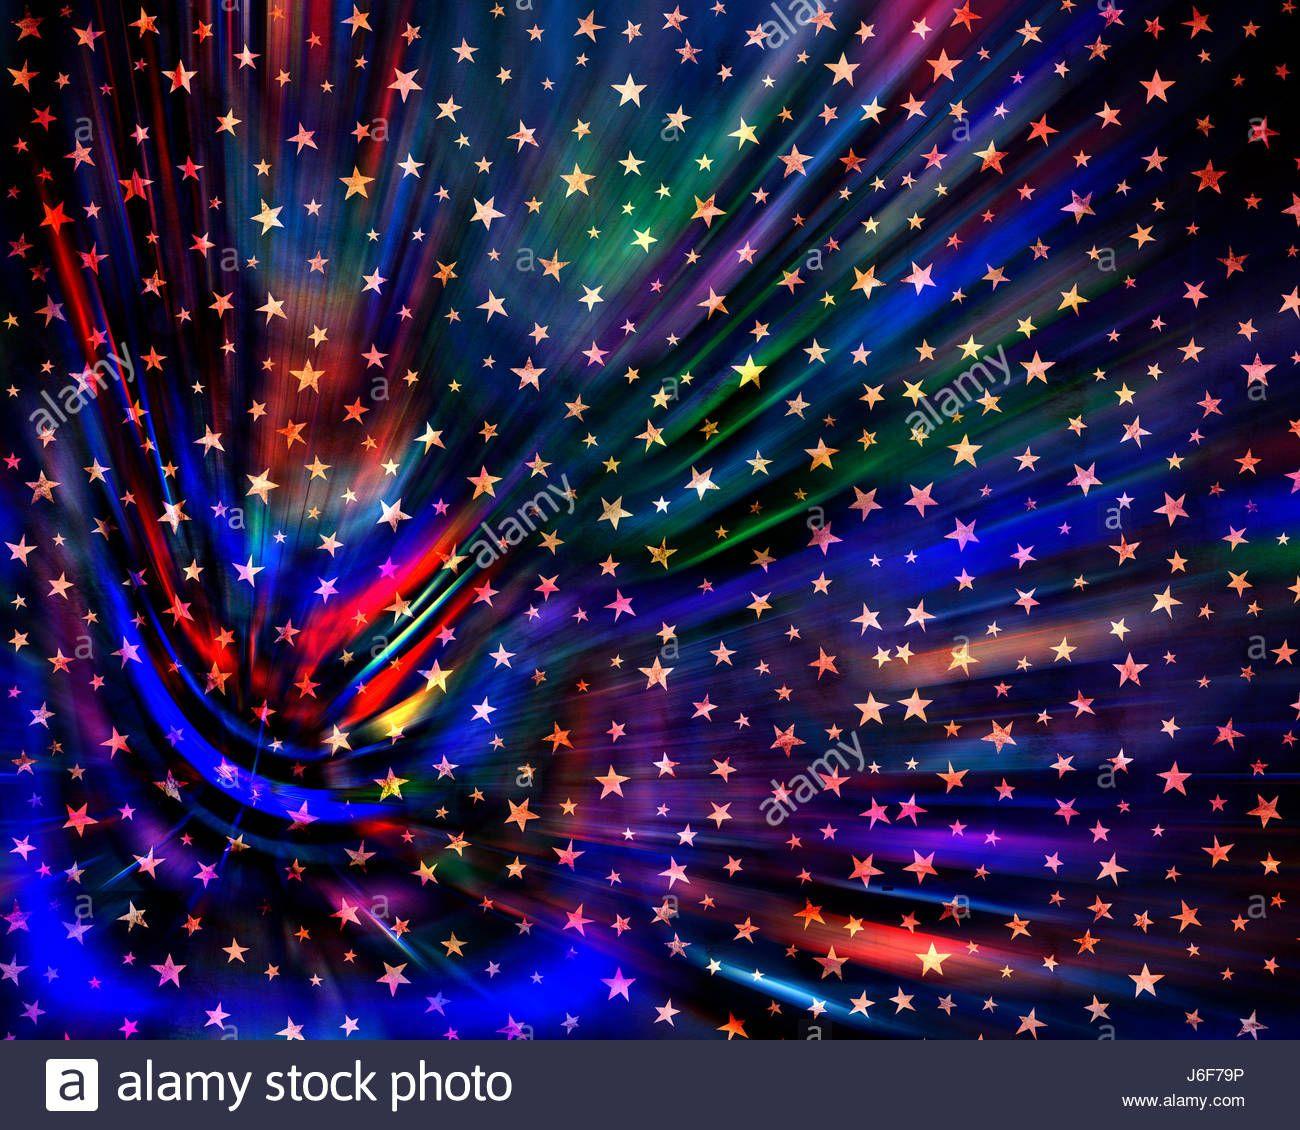 DIGITAL ART: Universal Universe #alamy #nagele #nagelestock